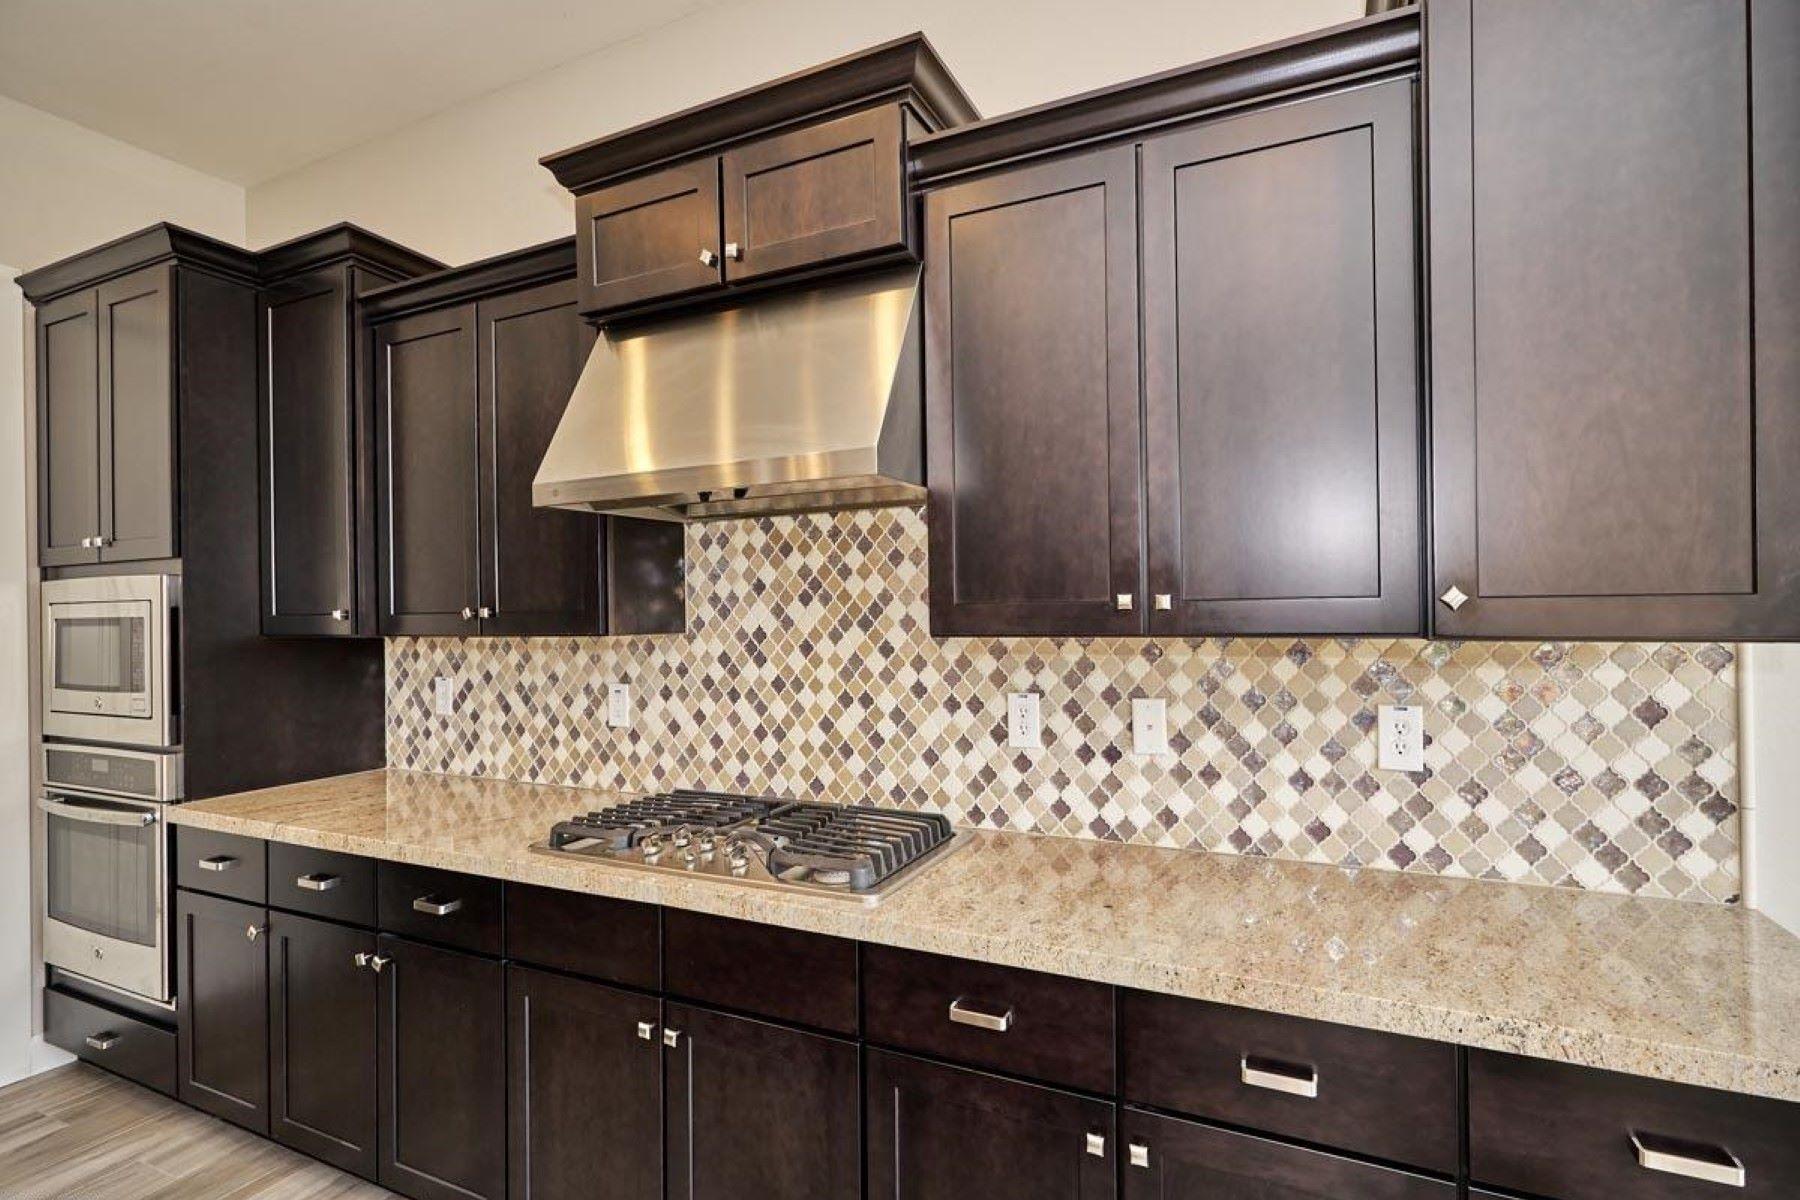 Single Family Homes για την Πώληση στο 4133 East Gable Avenue, Mesa, AZ 85206 Mesa, Αριζονα 85206 Ηνωμένες Πολιτείες